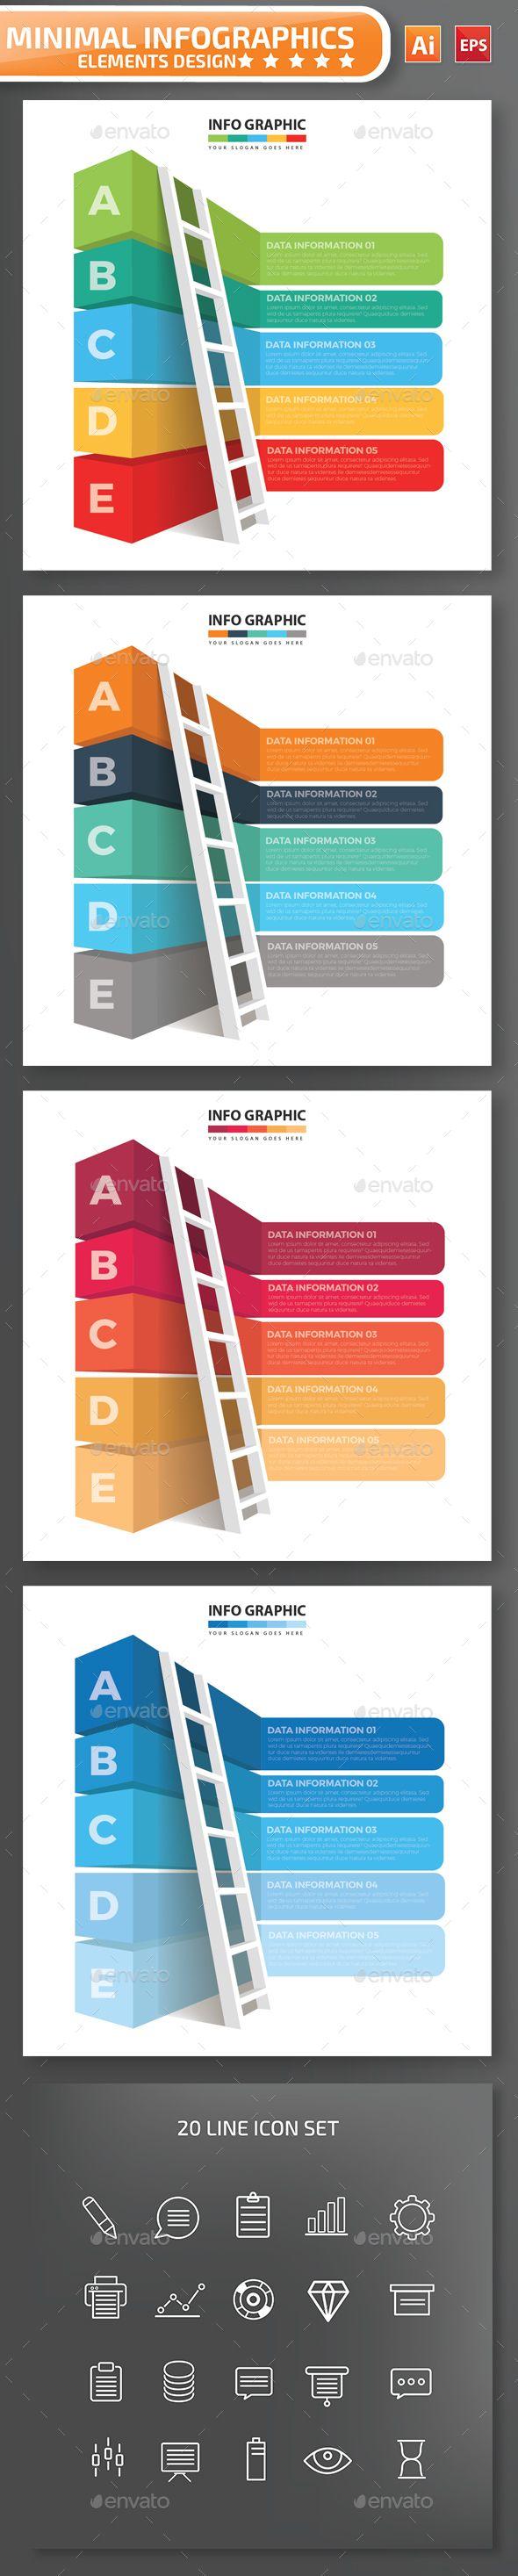 Minimal infographic Design - Infographics